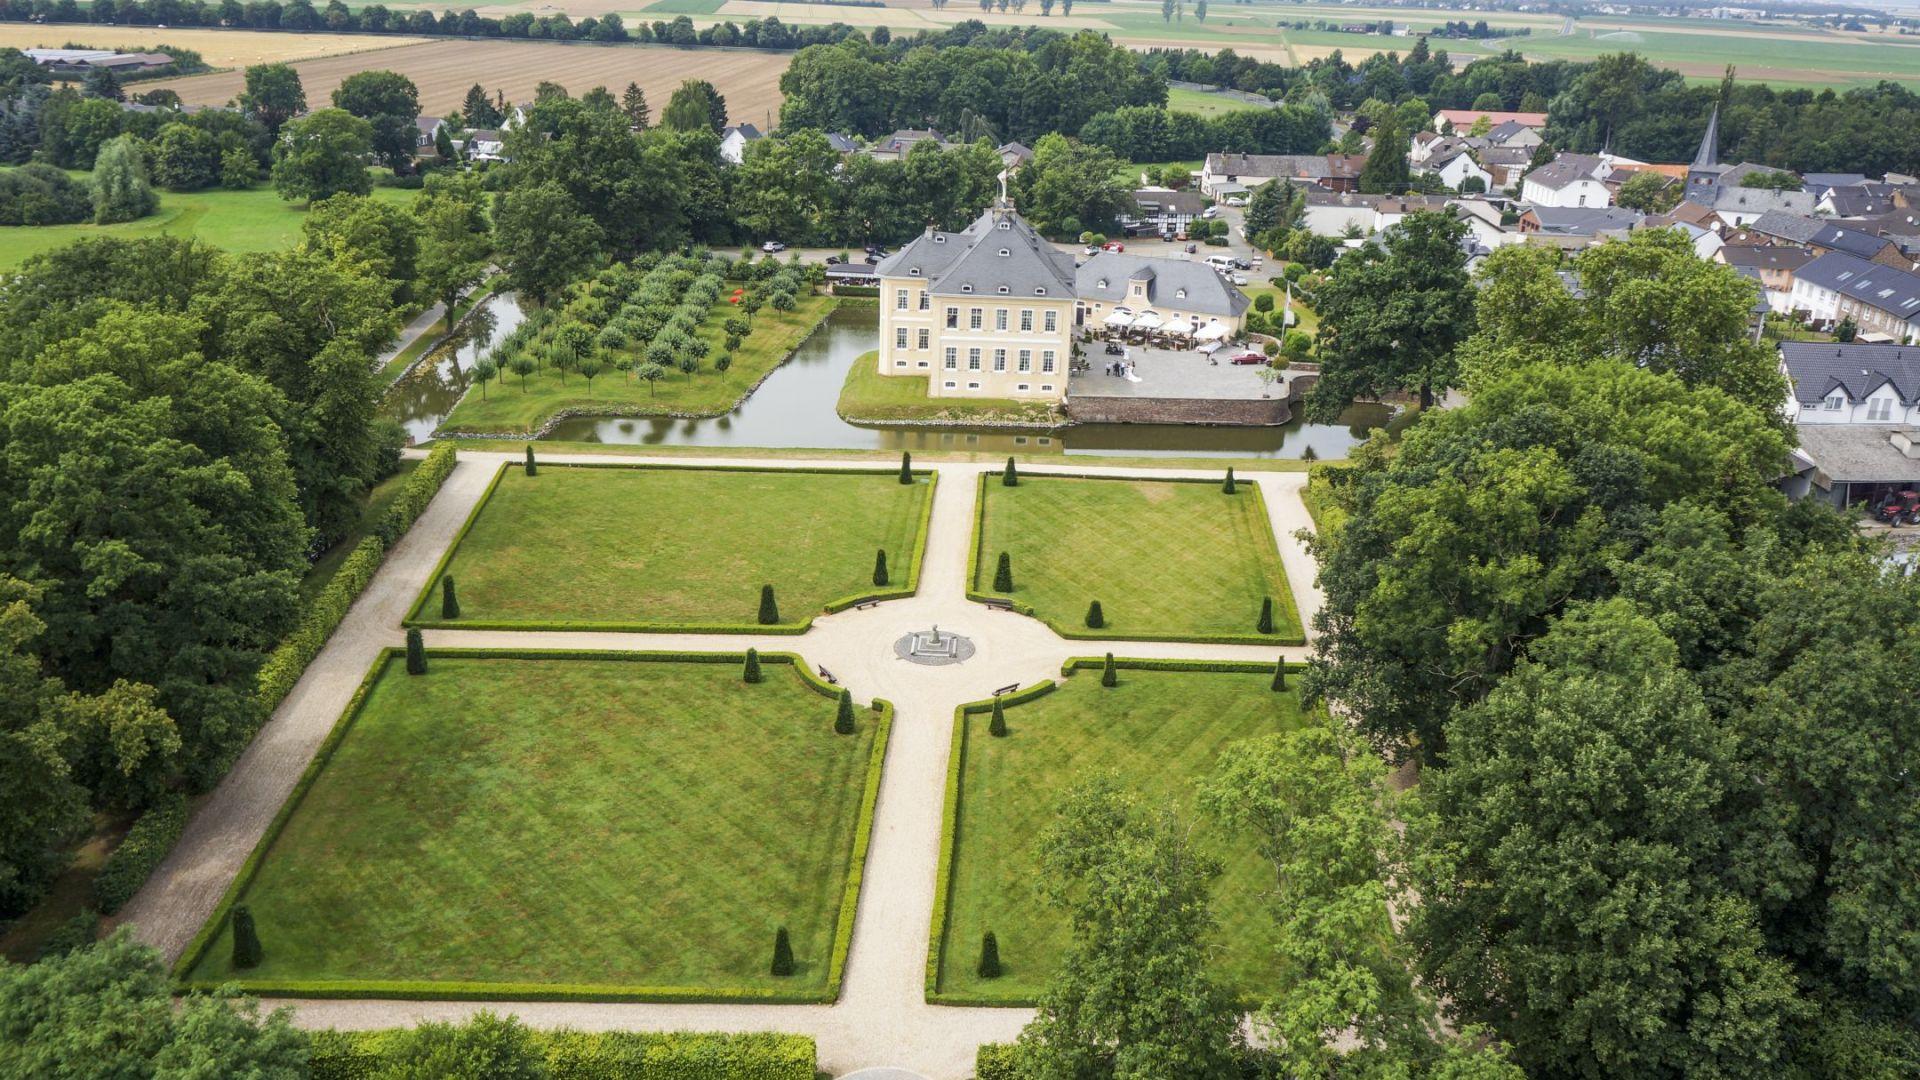 Golfplatz in Swisttal - Miel